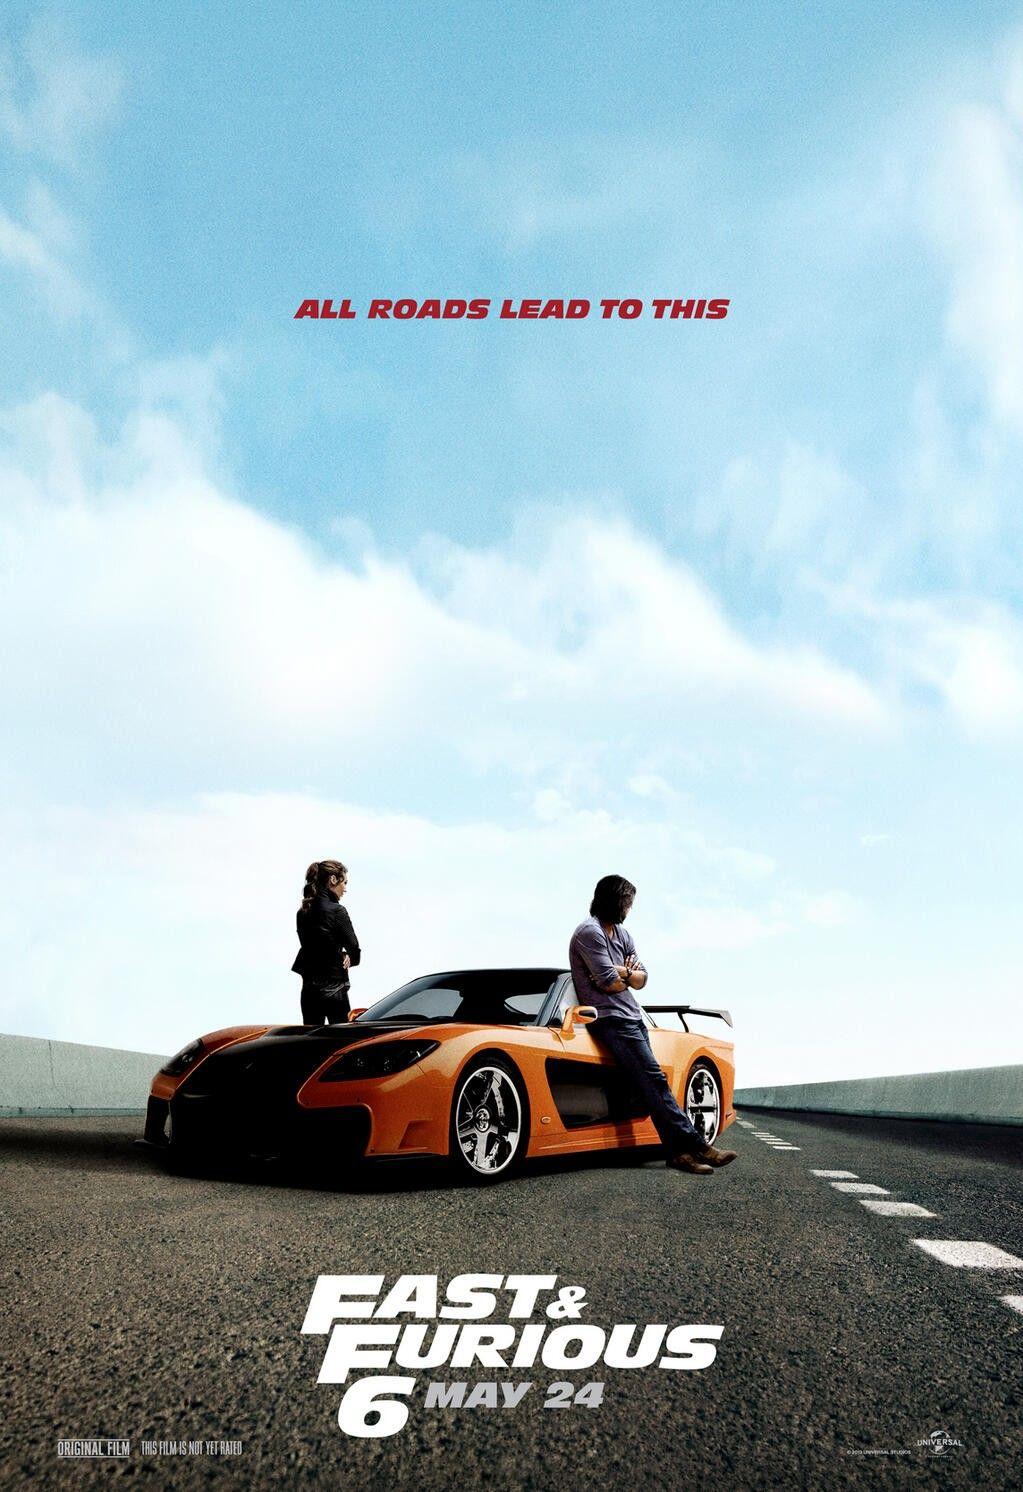 Fast Furious 6 New Posters Posteres De Filmes Velozes E